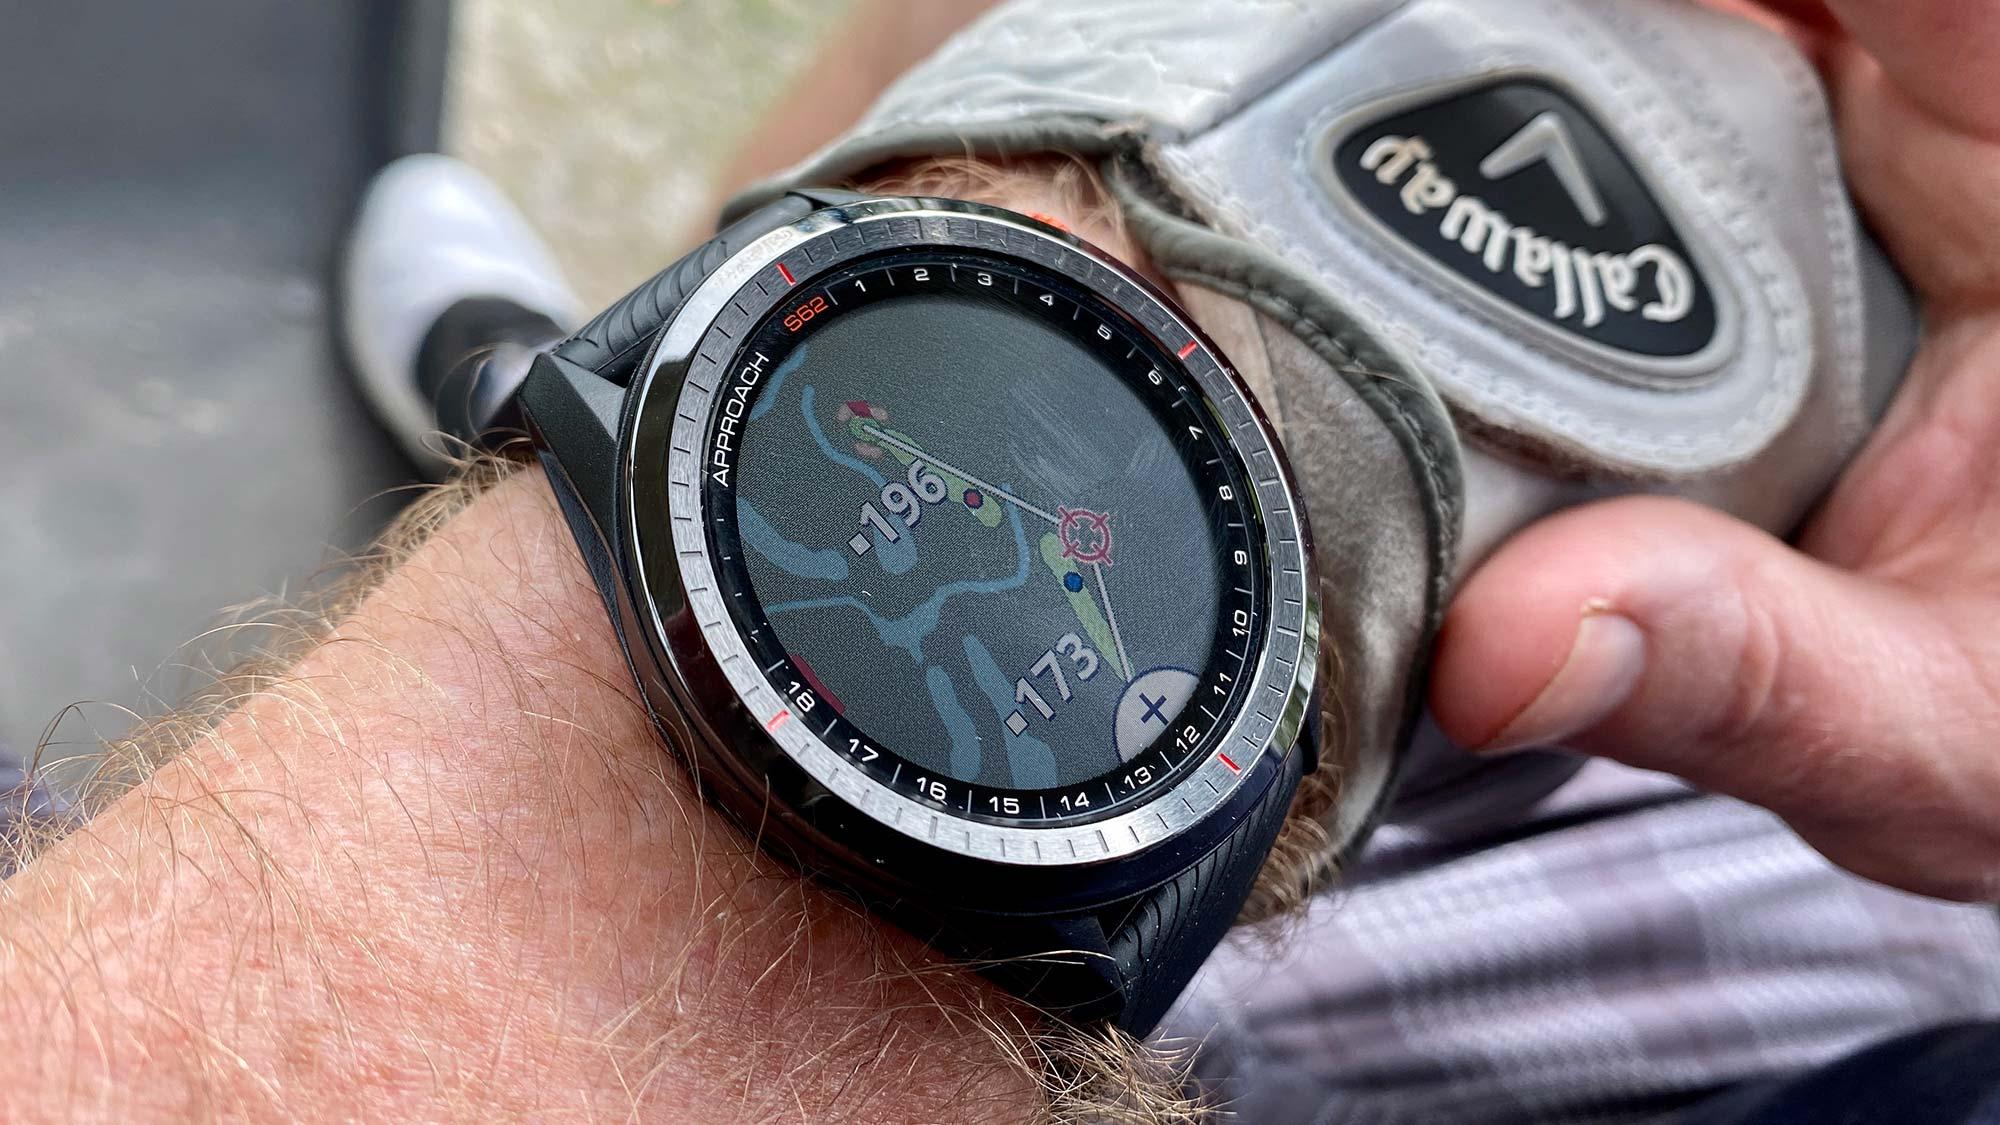 mejores relojes deportivos: Garmin Approach S62